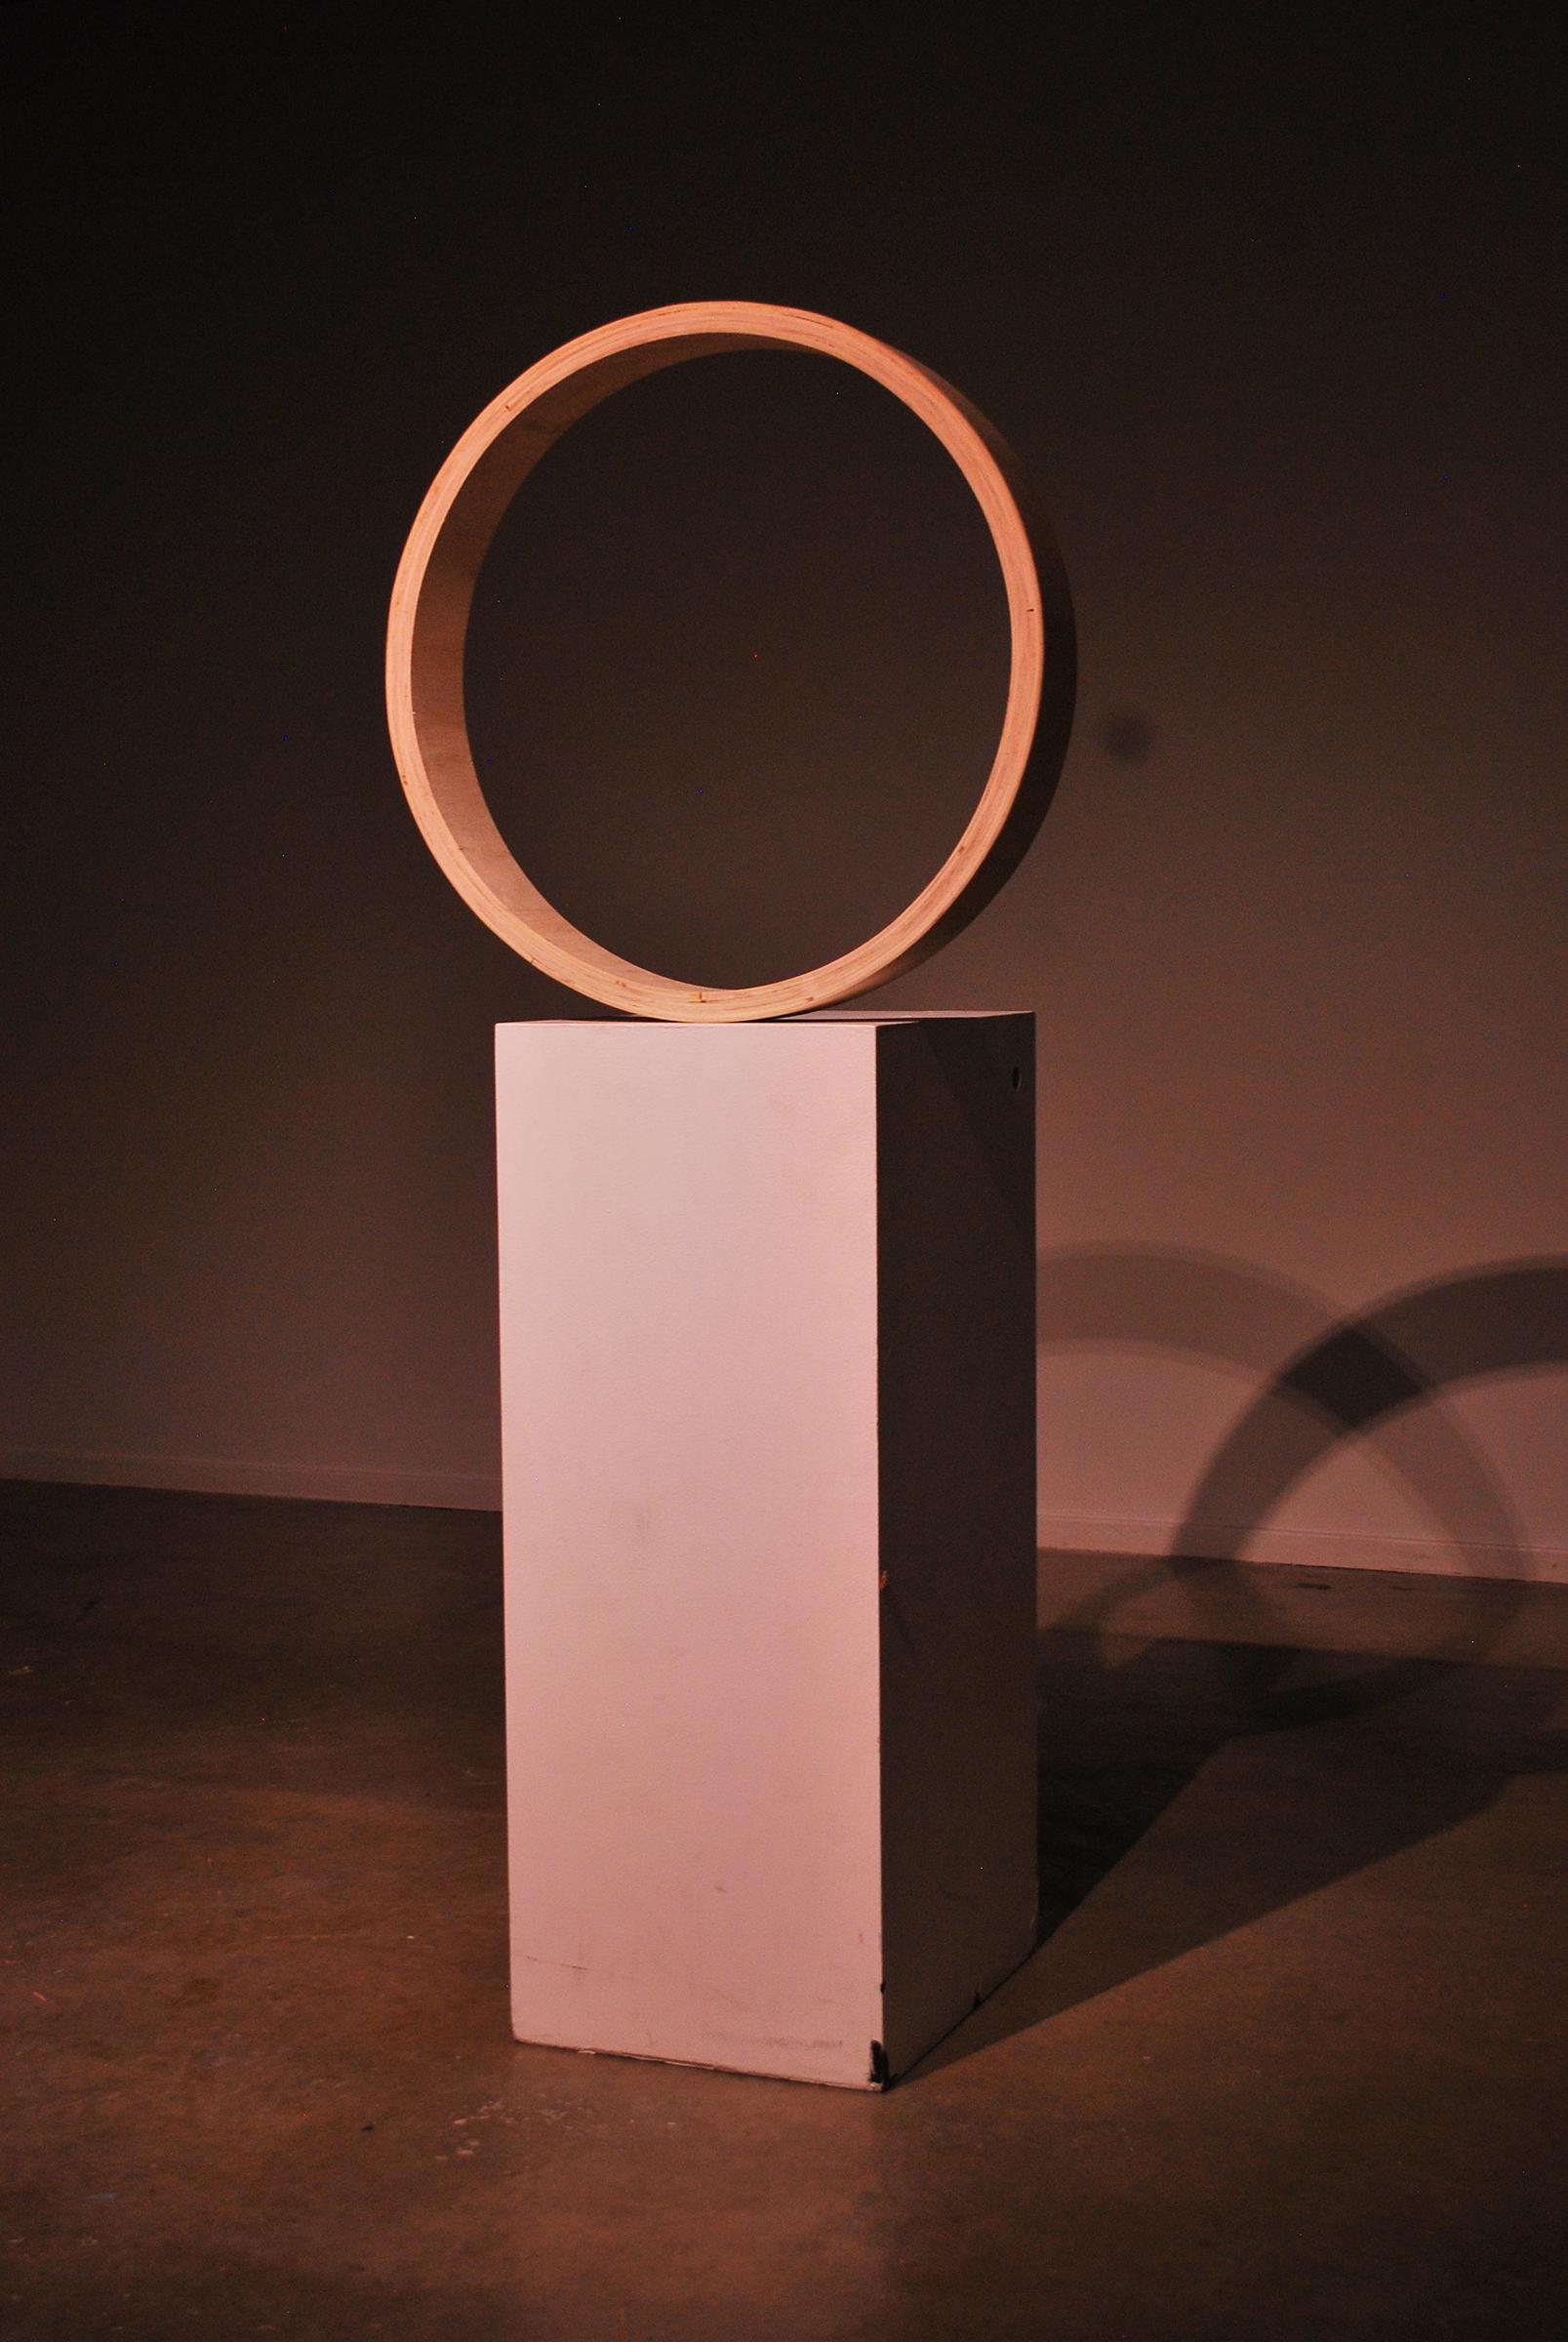 Diogenes IV (Compulsive), wood sculpture by Nicholas Christensen.